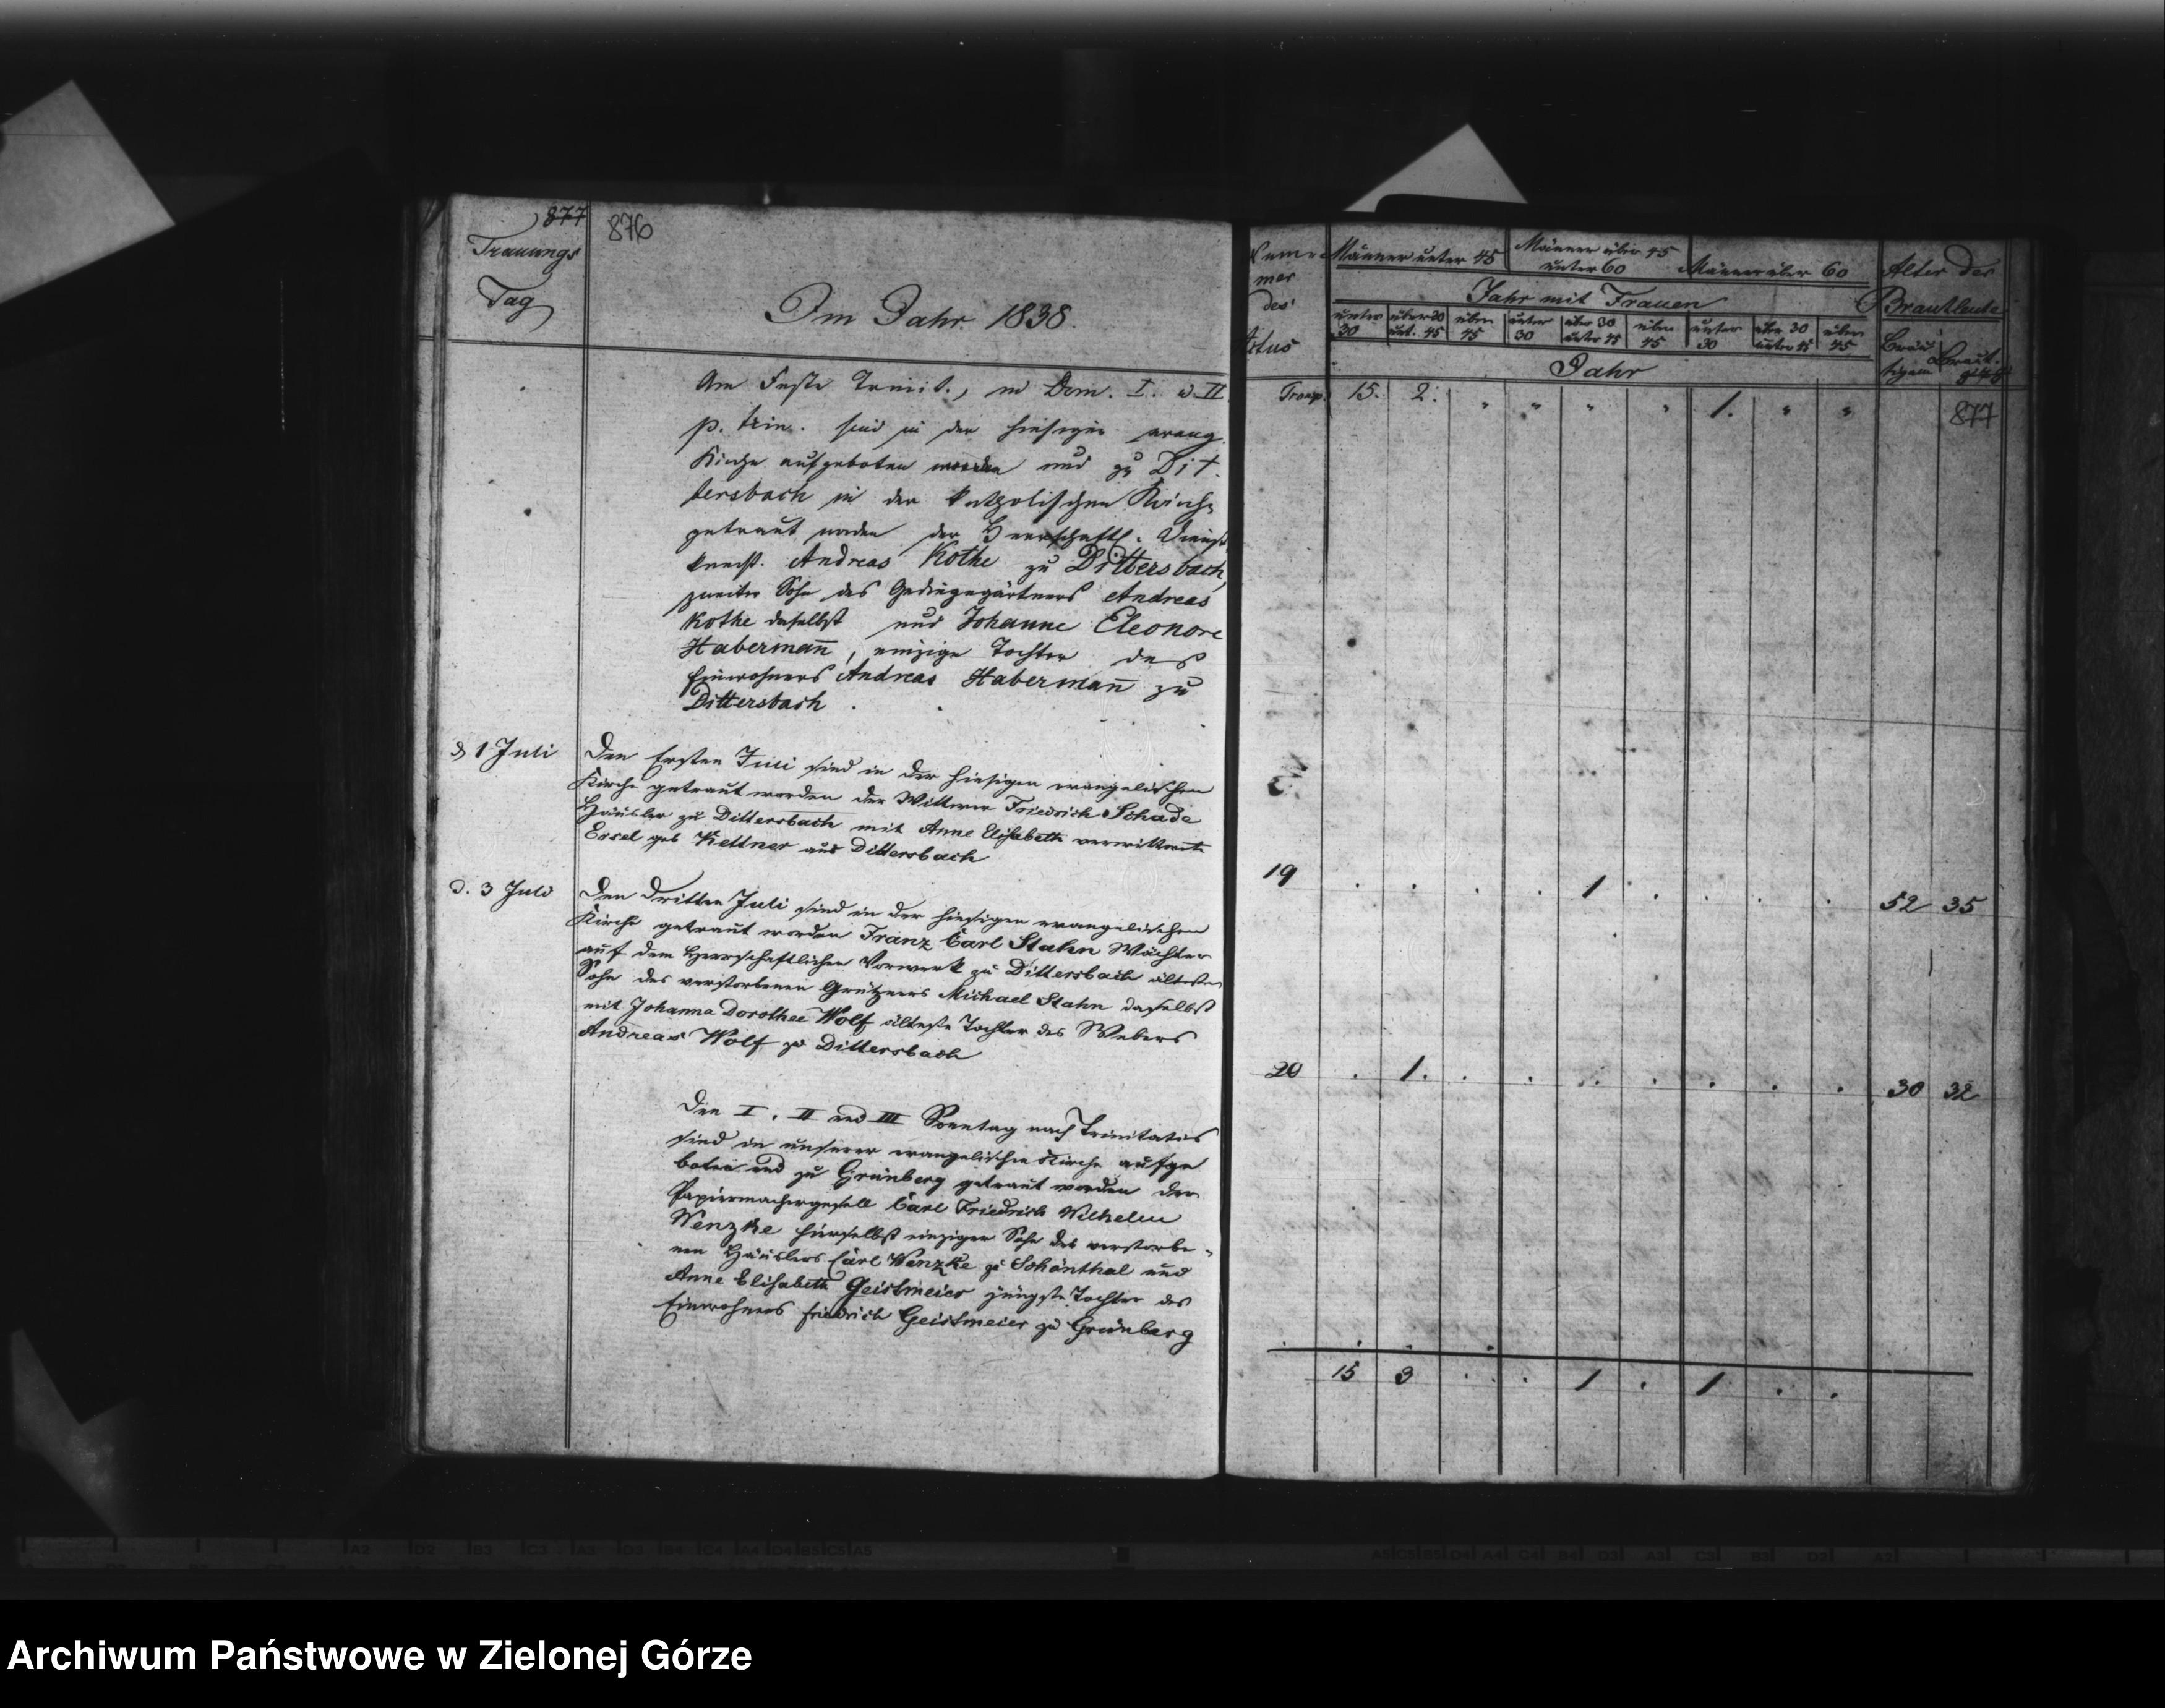 Skan z jednostki: Traubuch 1815 - 1839